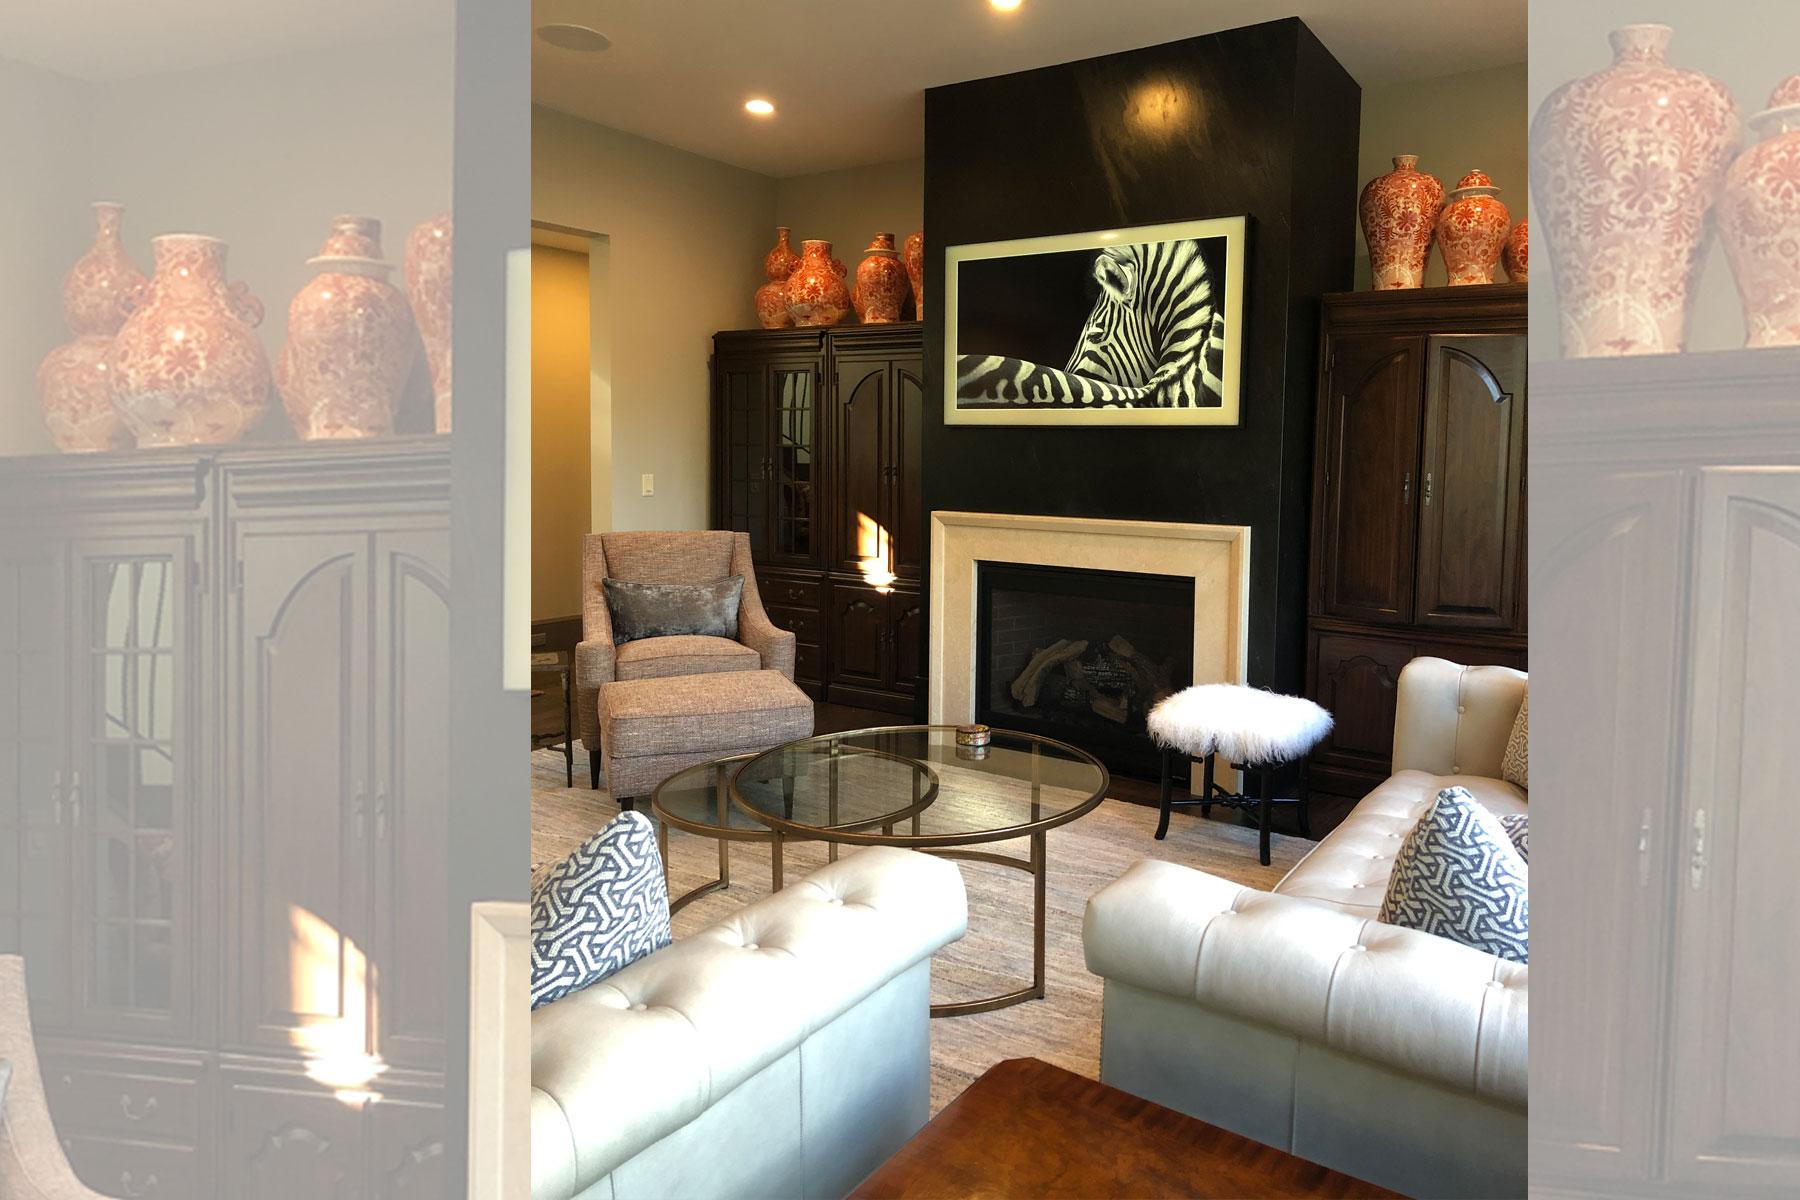 lower-level-living-room-interior-design-ideas-modern